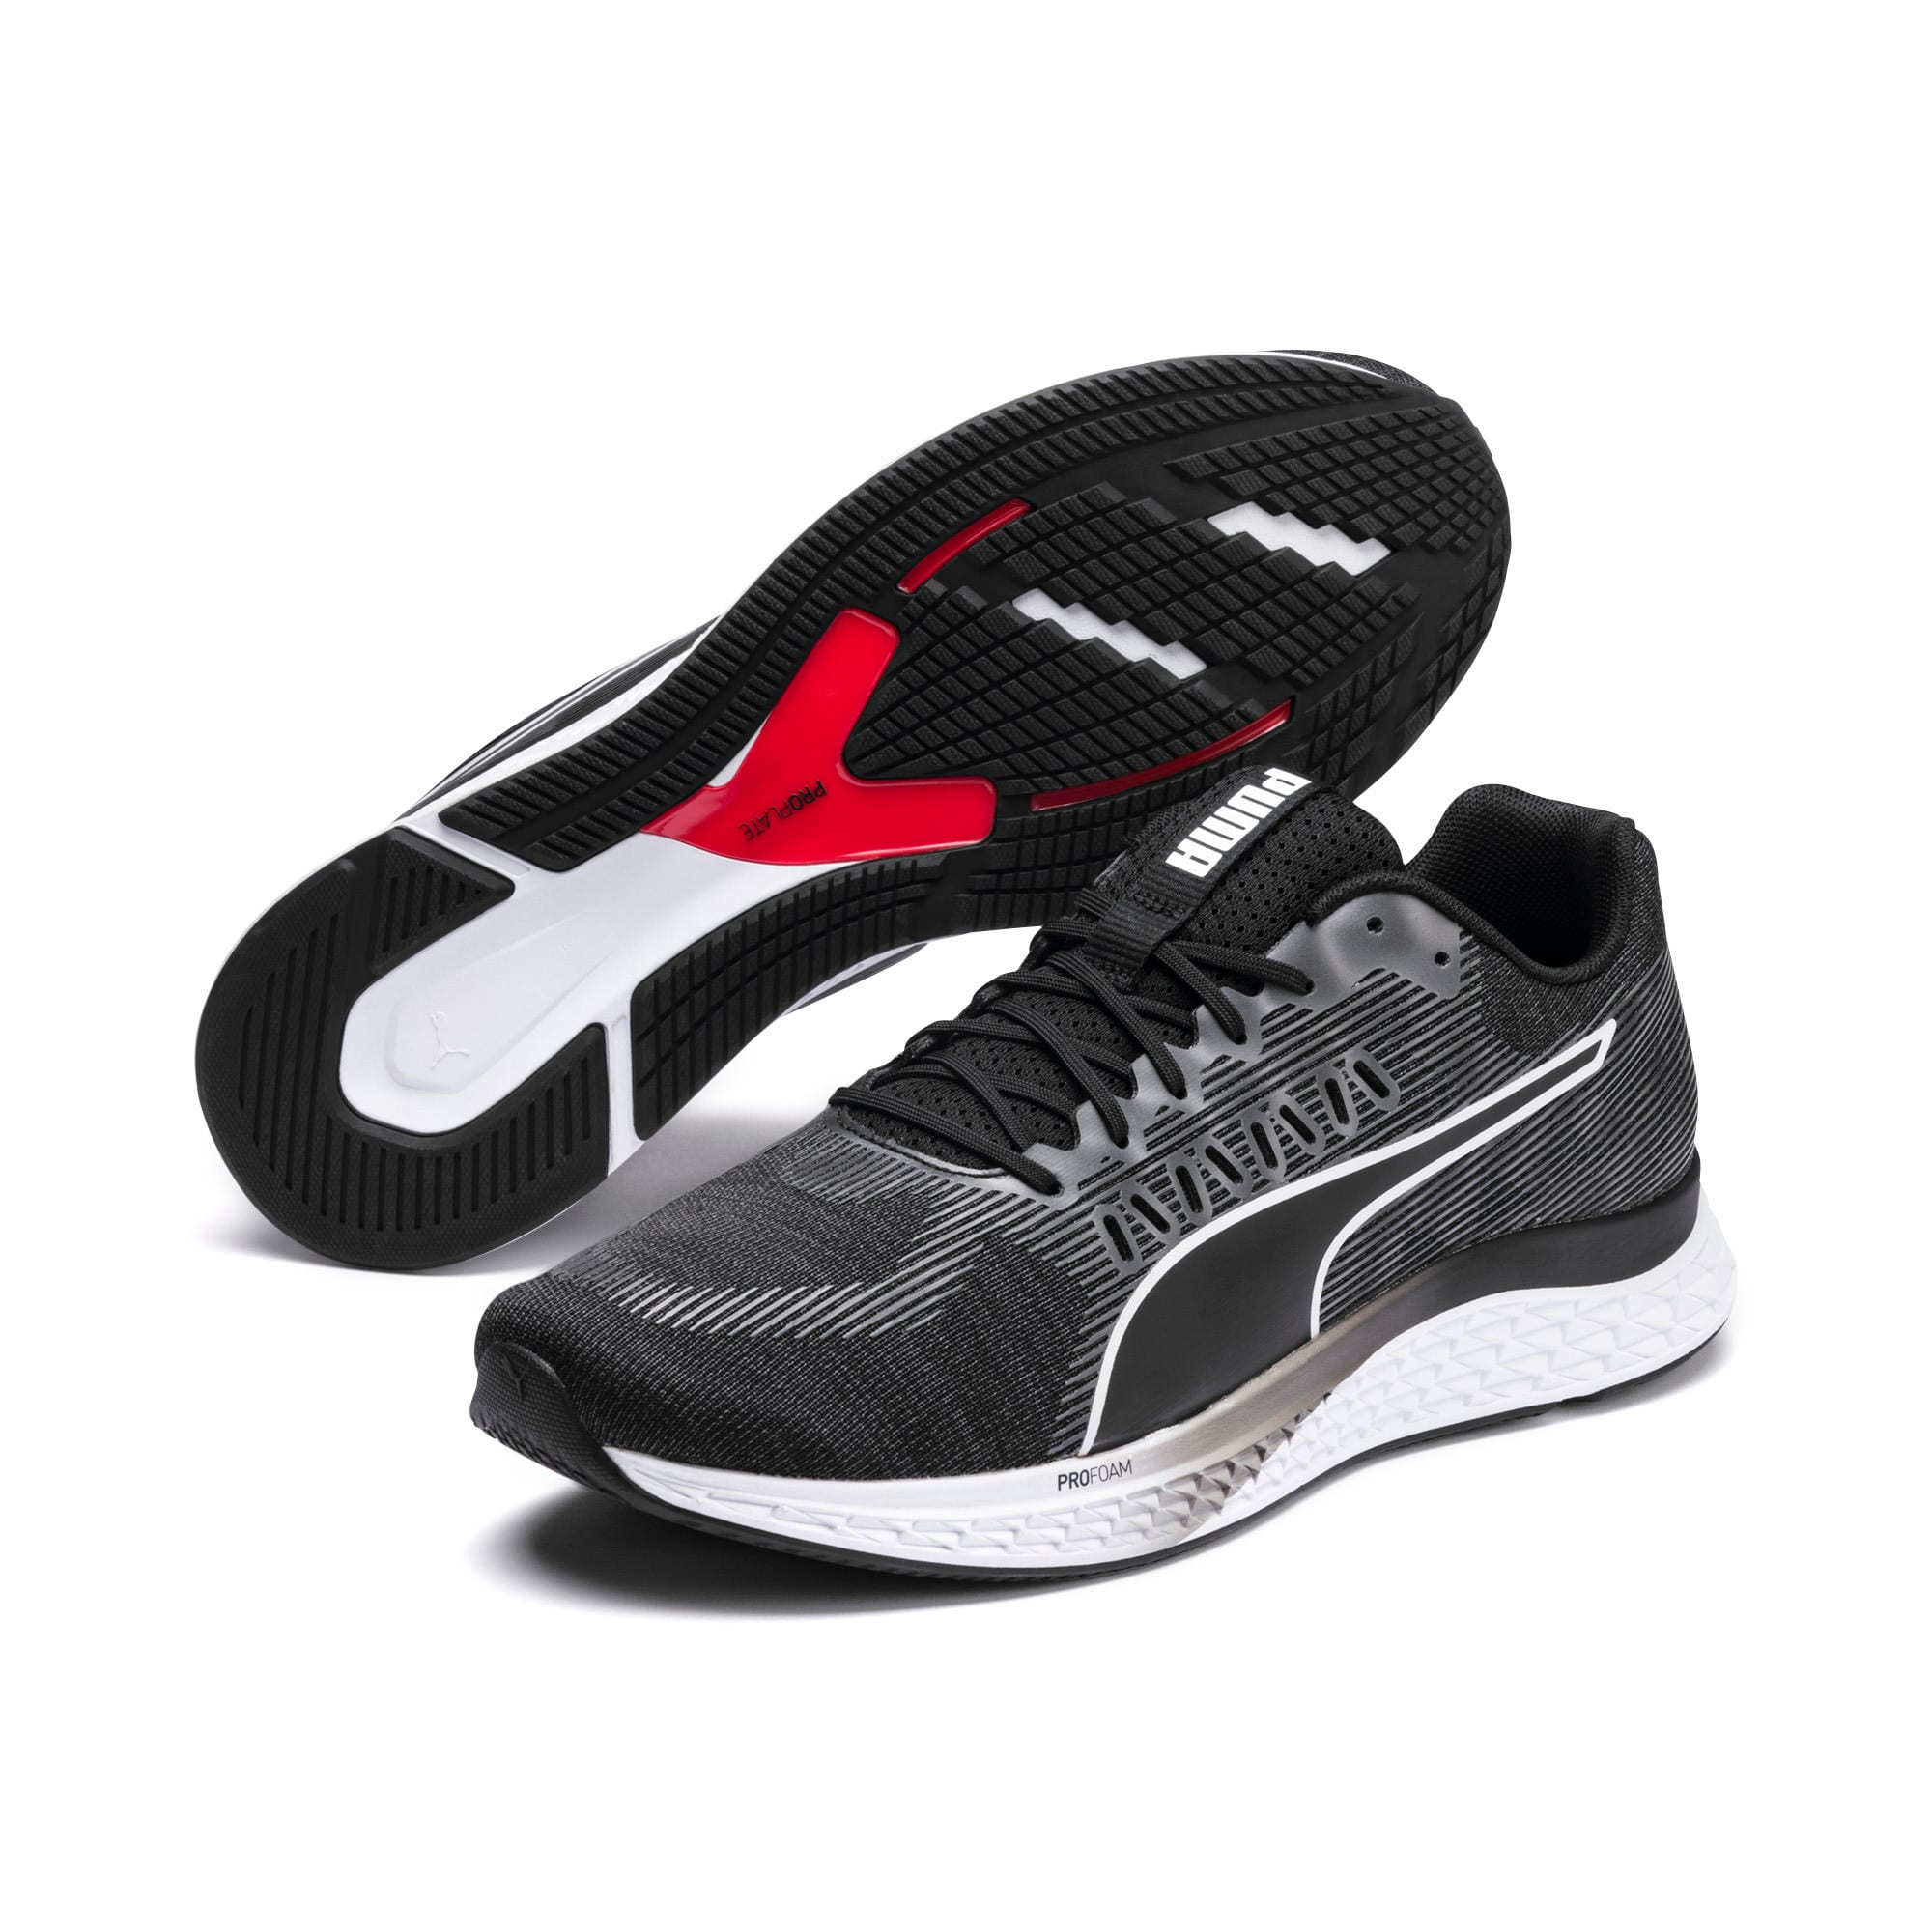 Thumbnail 2 of Chaussure de course SPEED SUTAMINA, Puma Black-Puma White, medium